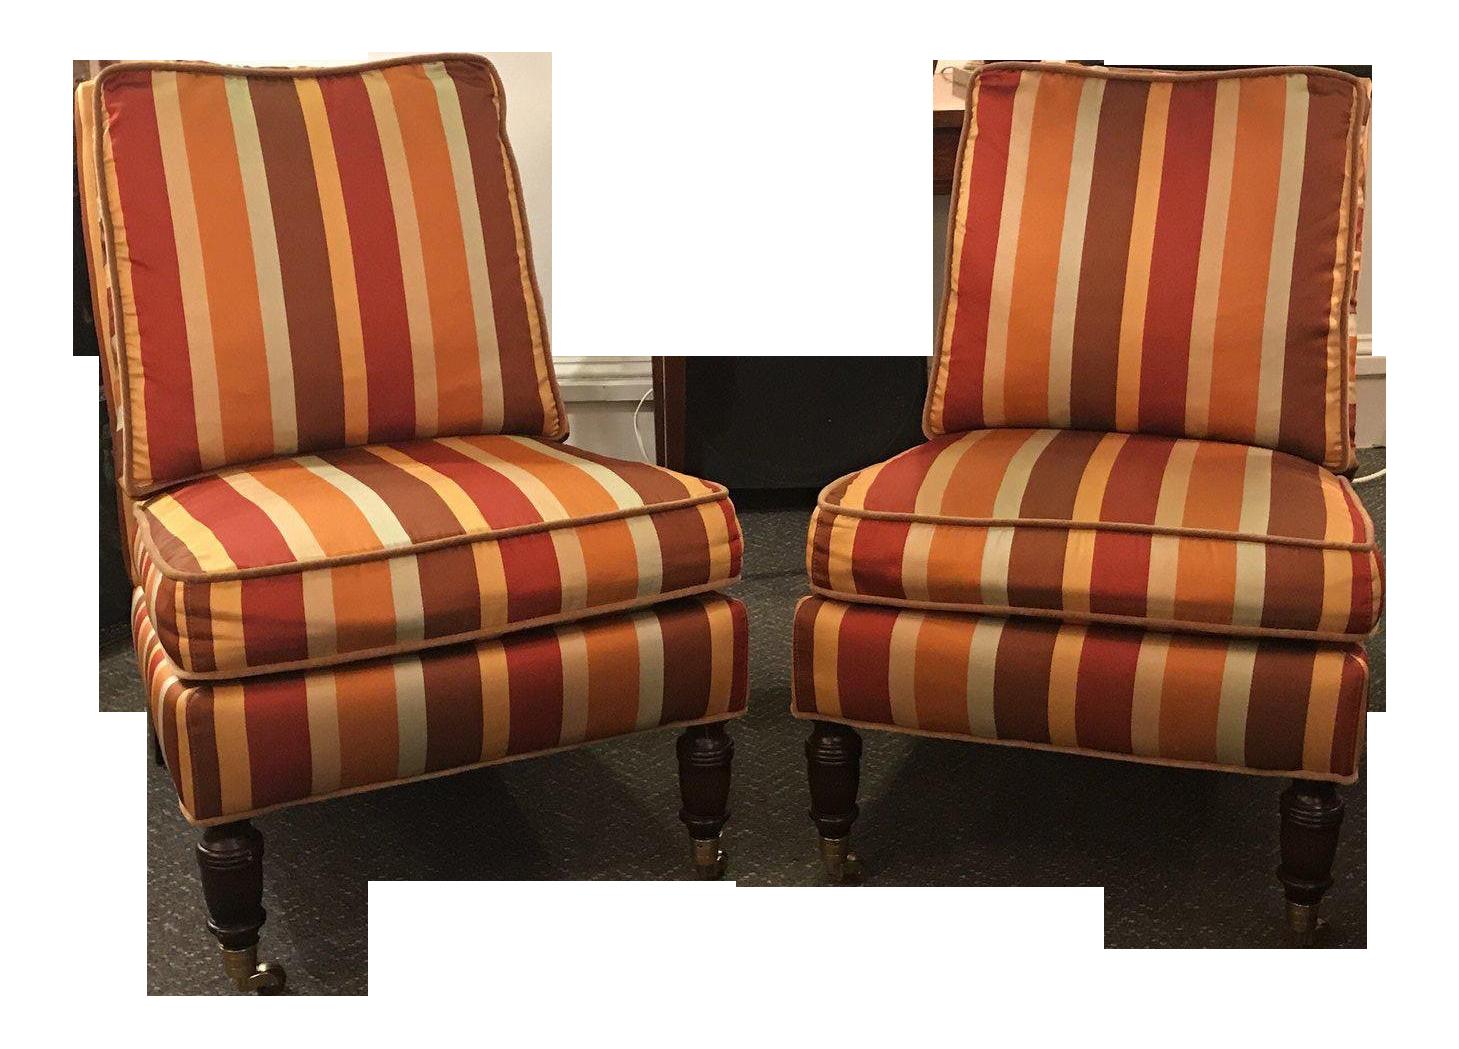 lillian august furniture. Lillian August Silk Striped Chairs - A Pair Furniture